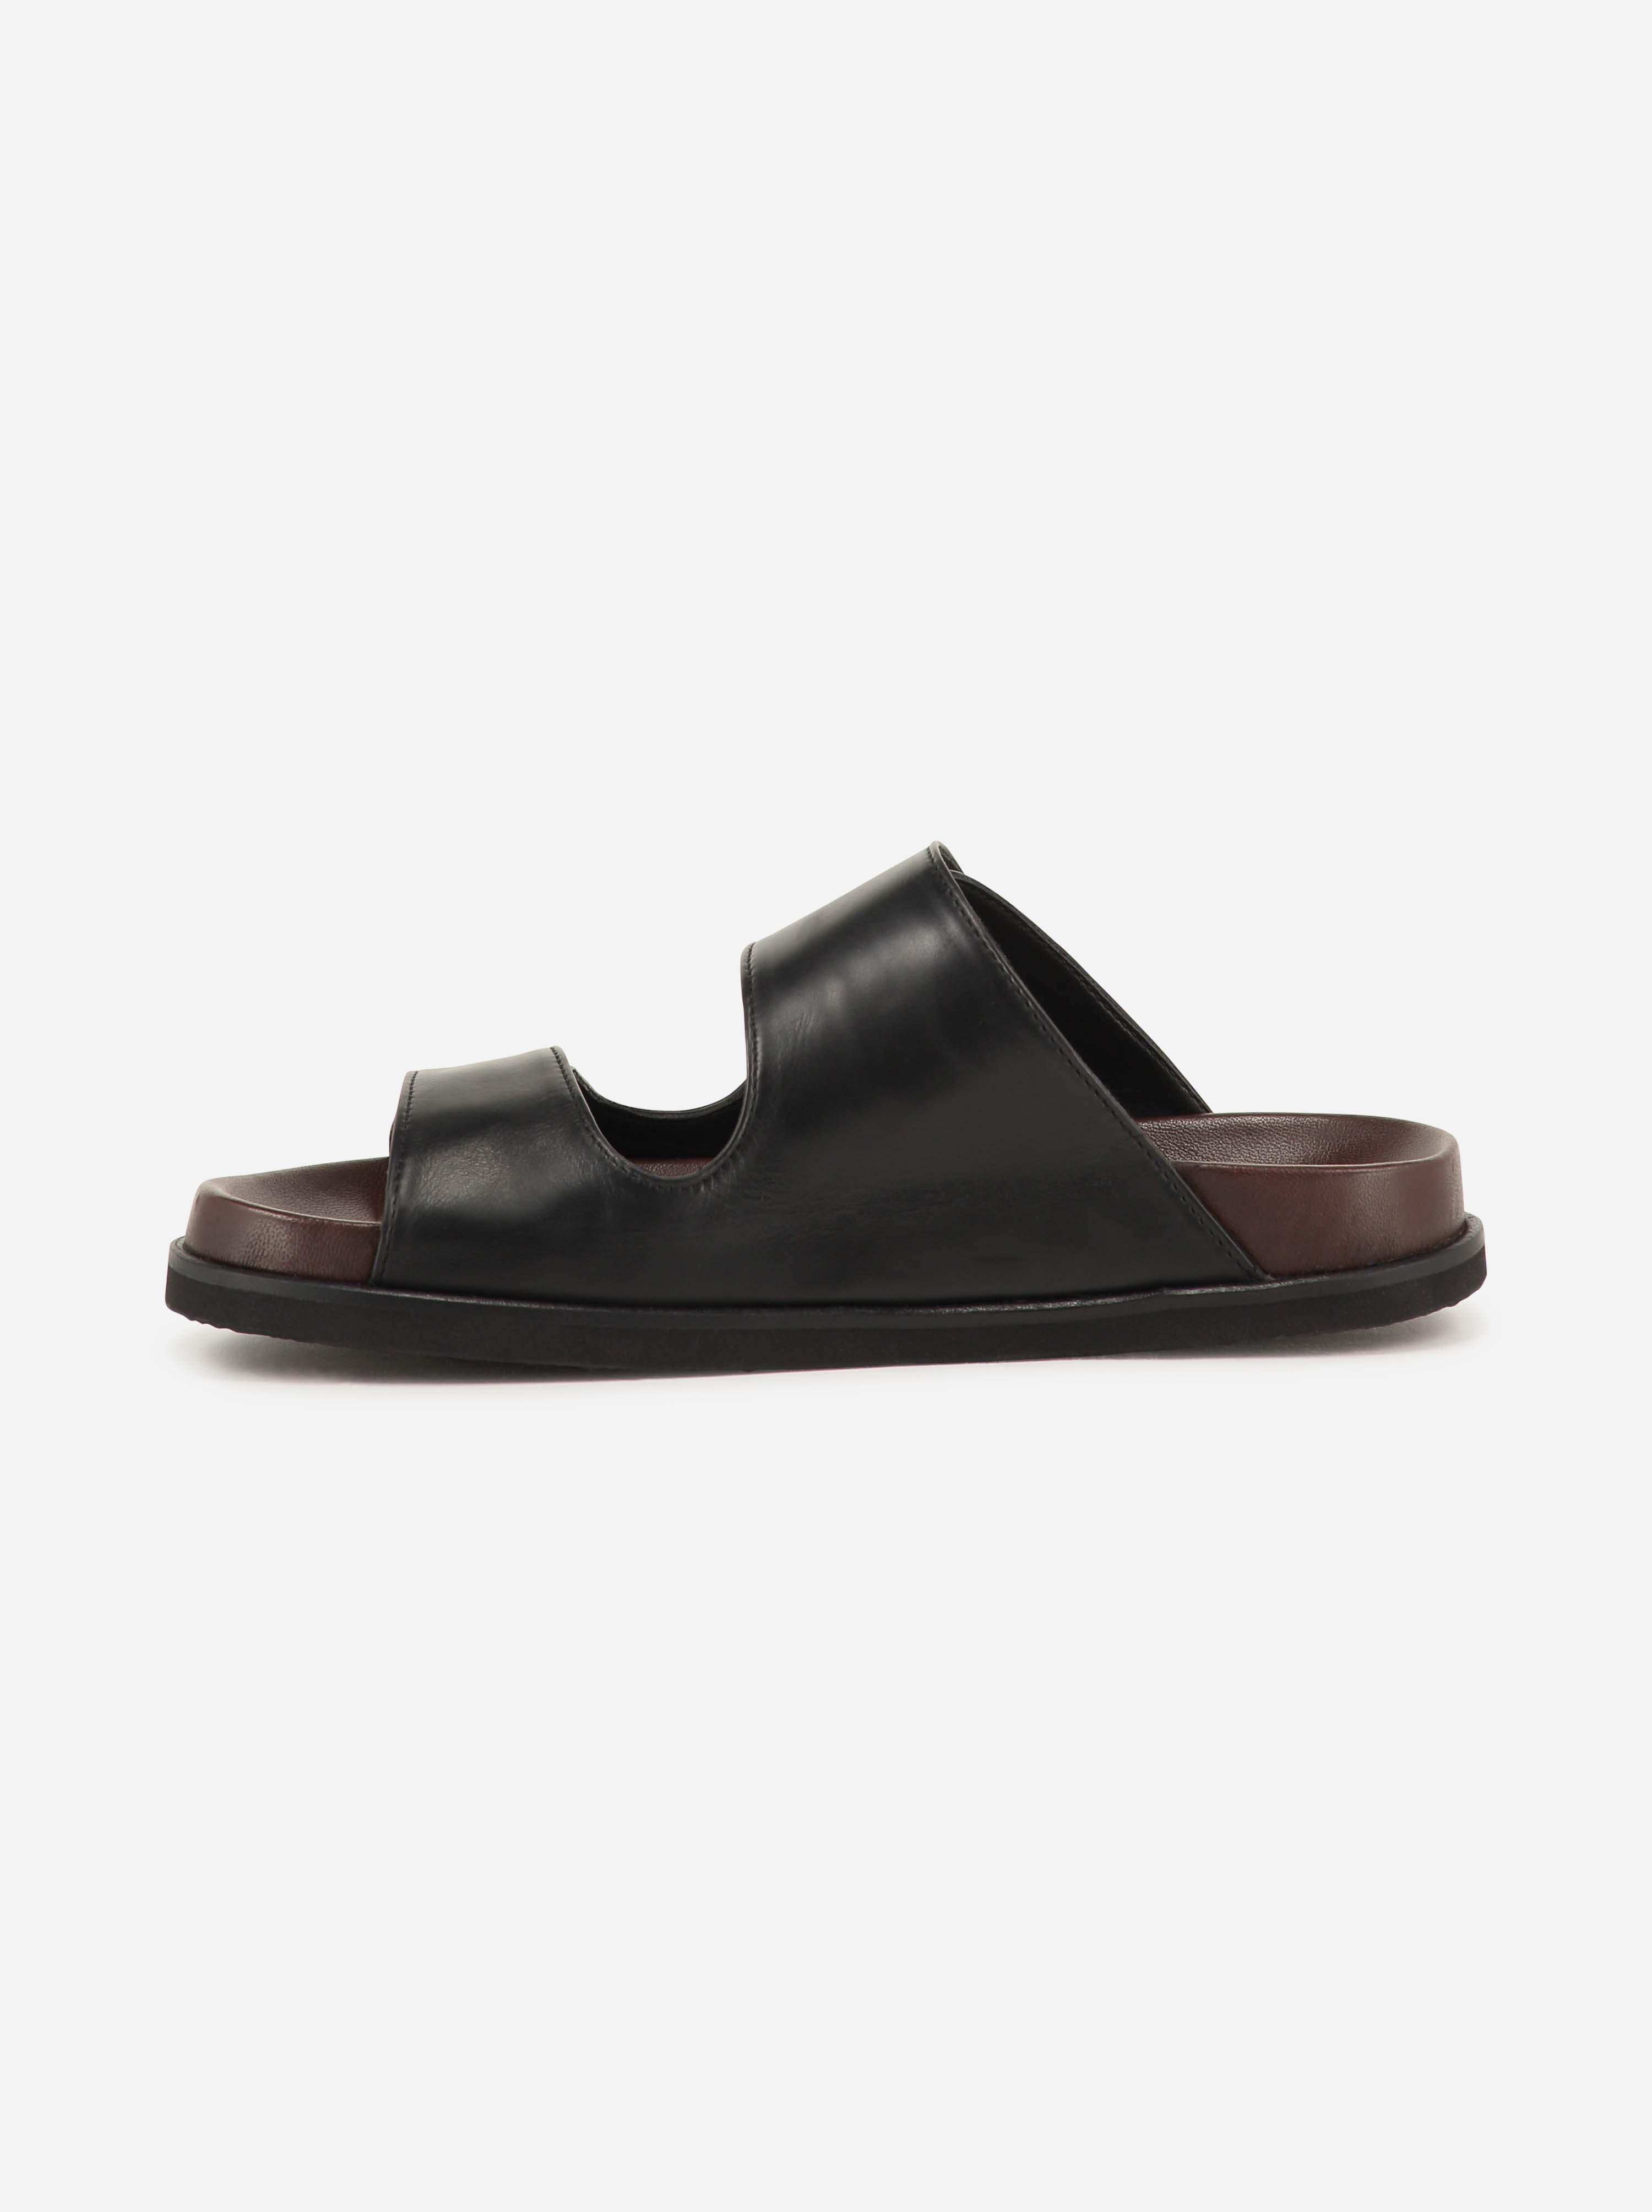 Teym - The Sandal - Black - 3